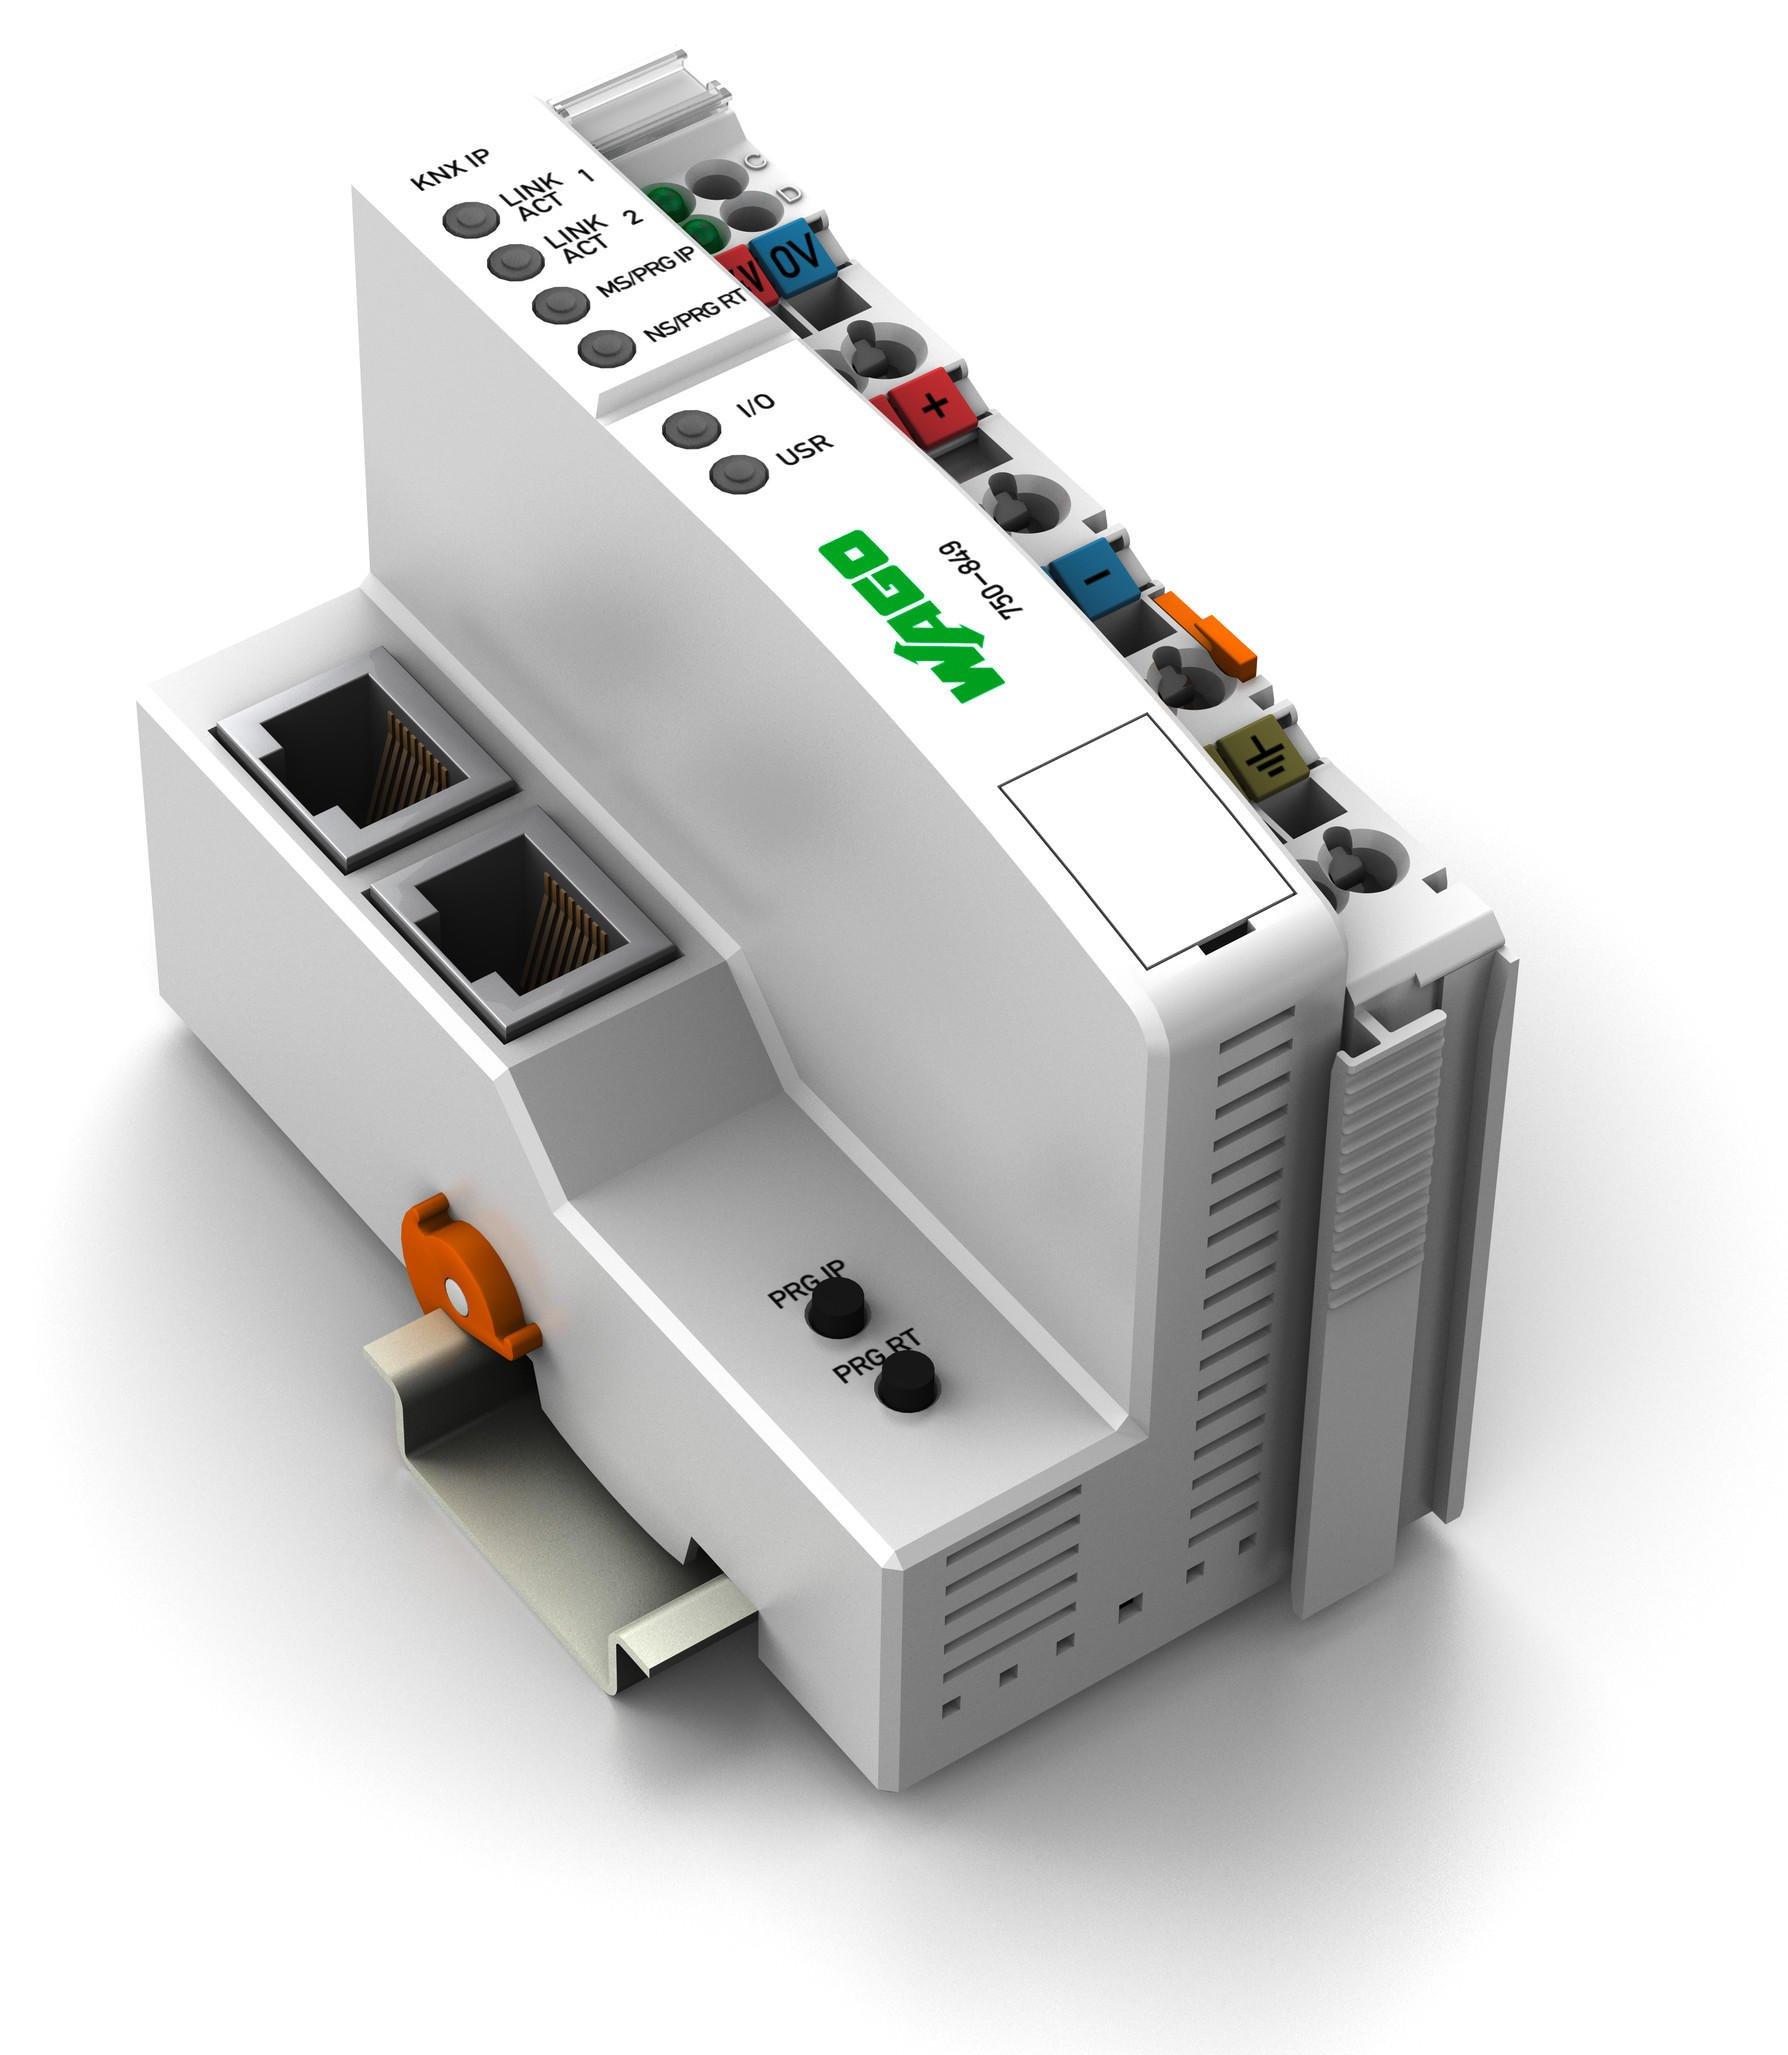 Wago   controller knx ip (750-849).